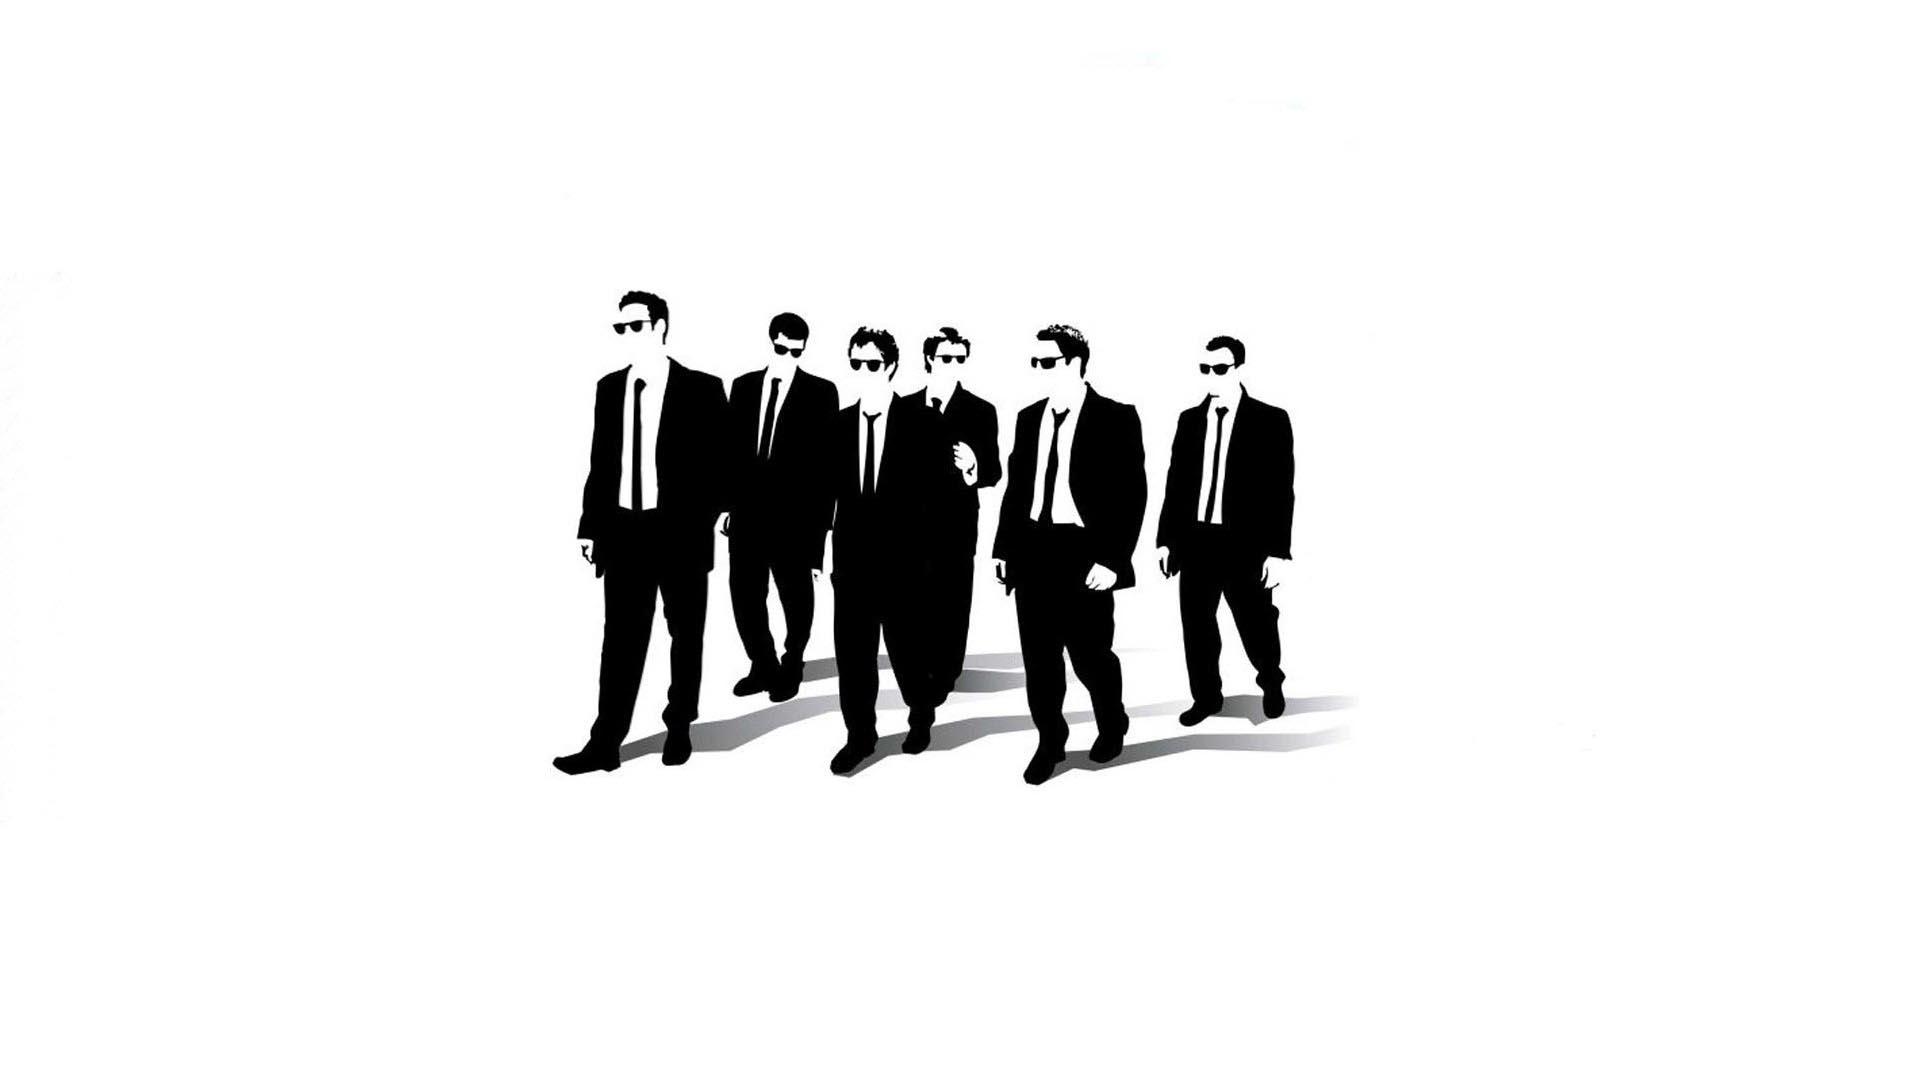 Reservoir Dogs Wallpapers - Wallpaper Cave